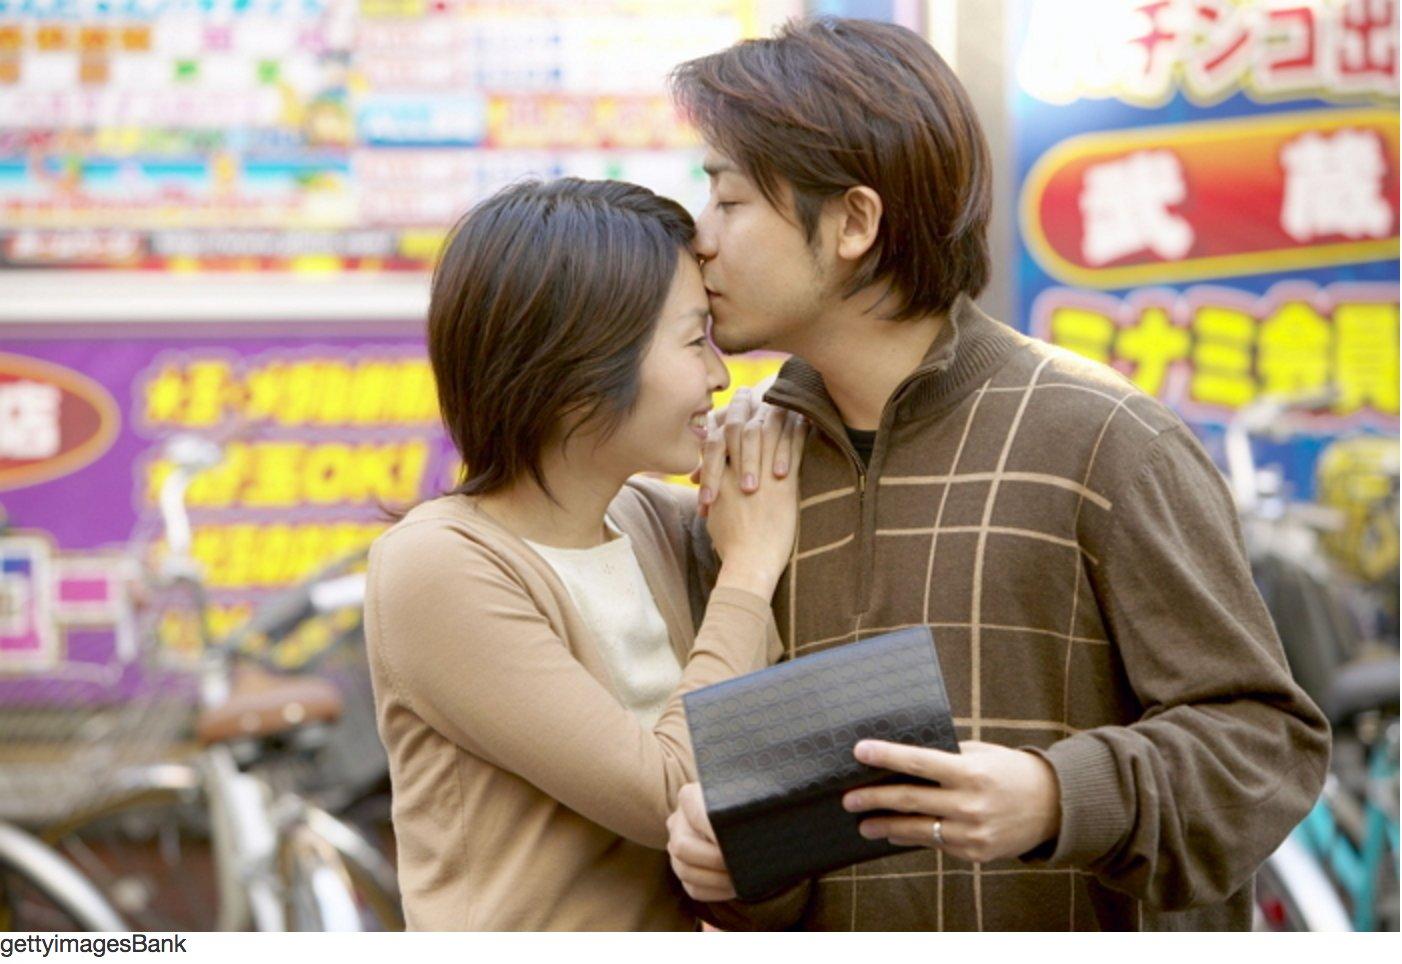 screen shot 2017 07 23 at 0 11 26 - 恋人とのキスで体に6つの変化が!